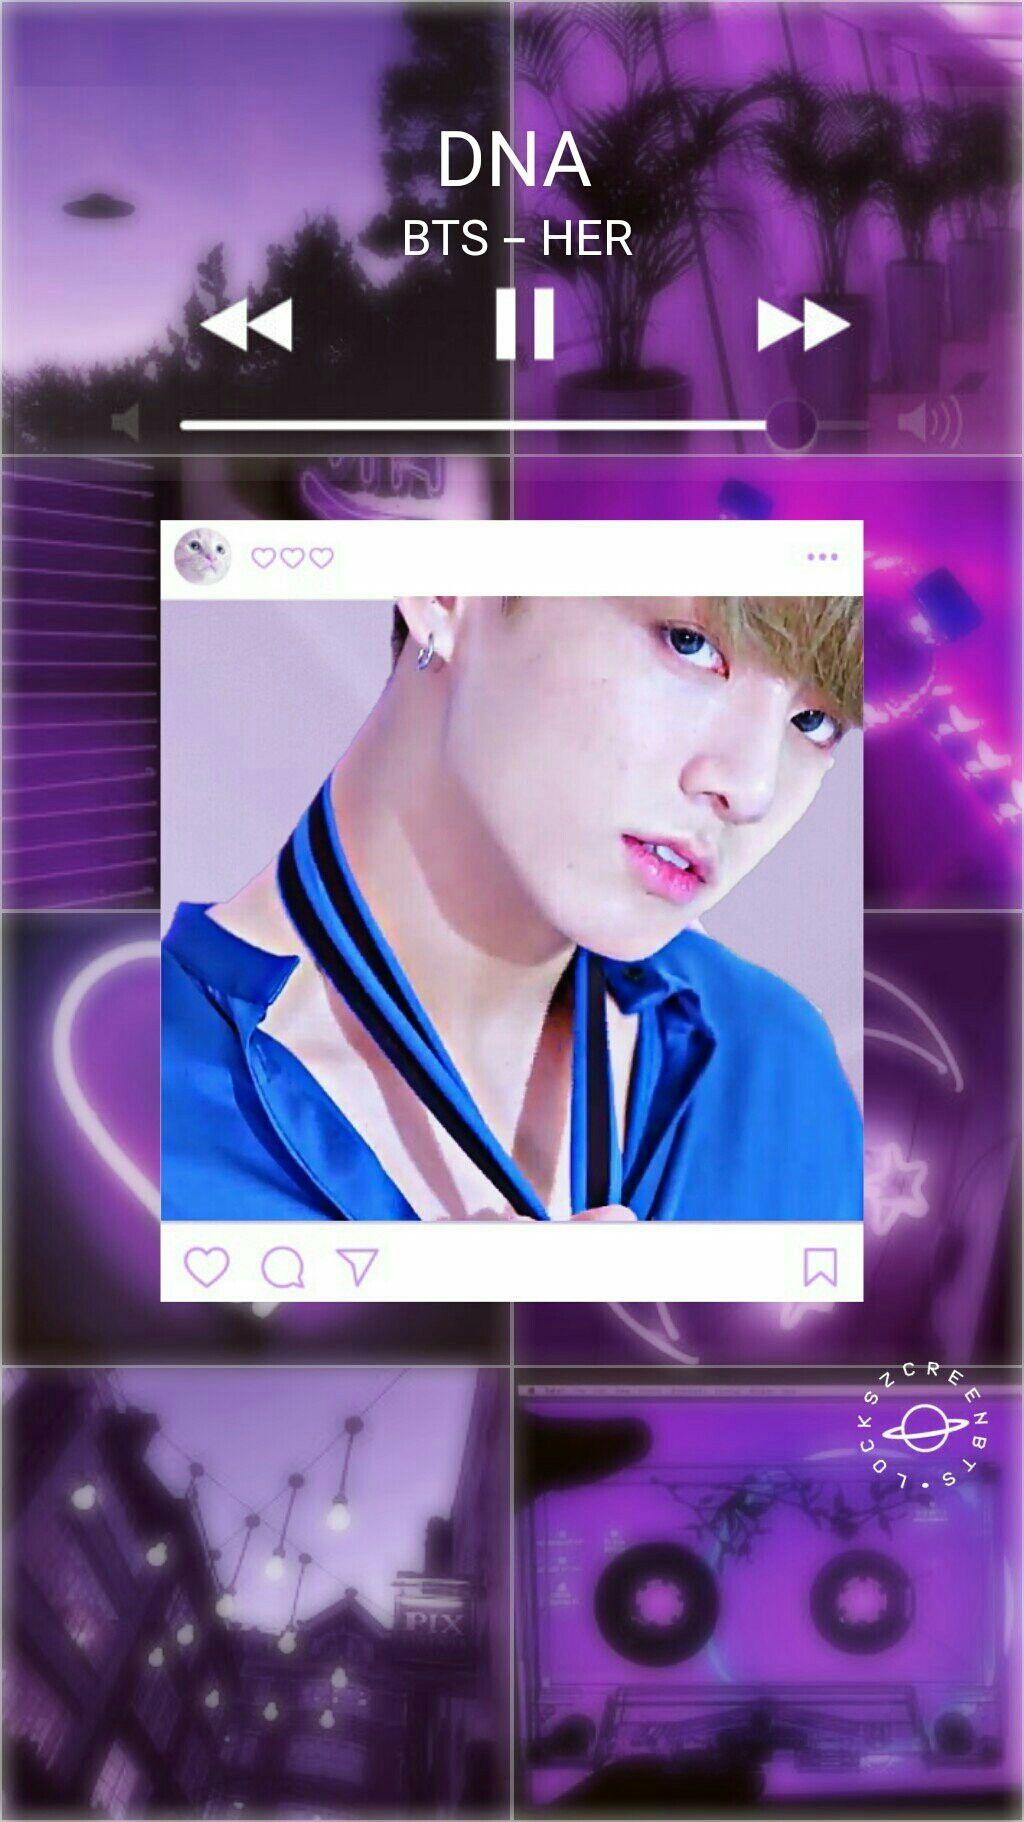 Jungkook || DNA wallpaper ♡ | BTS WALLPAPER | Pinterest